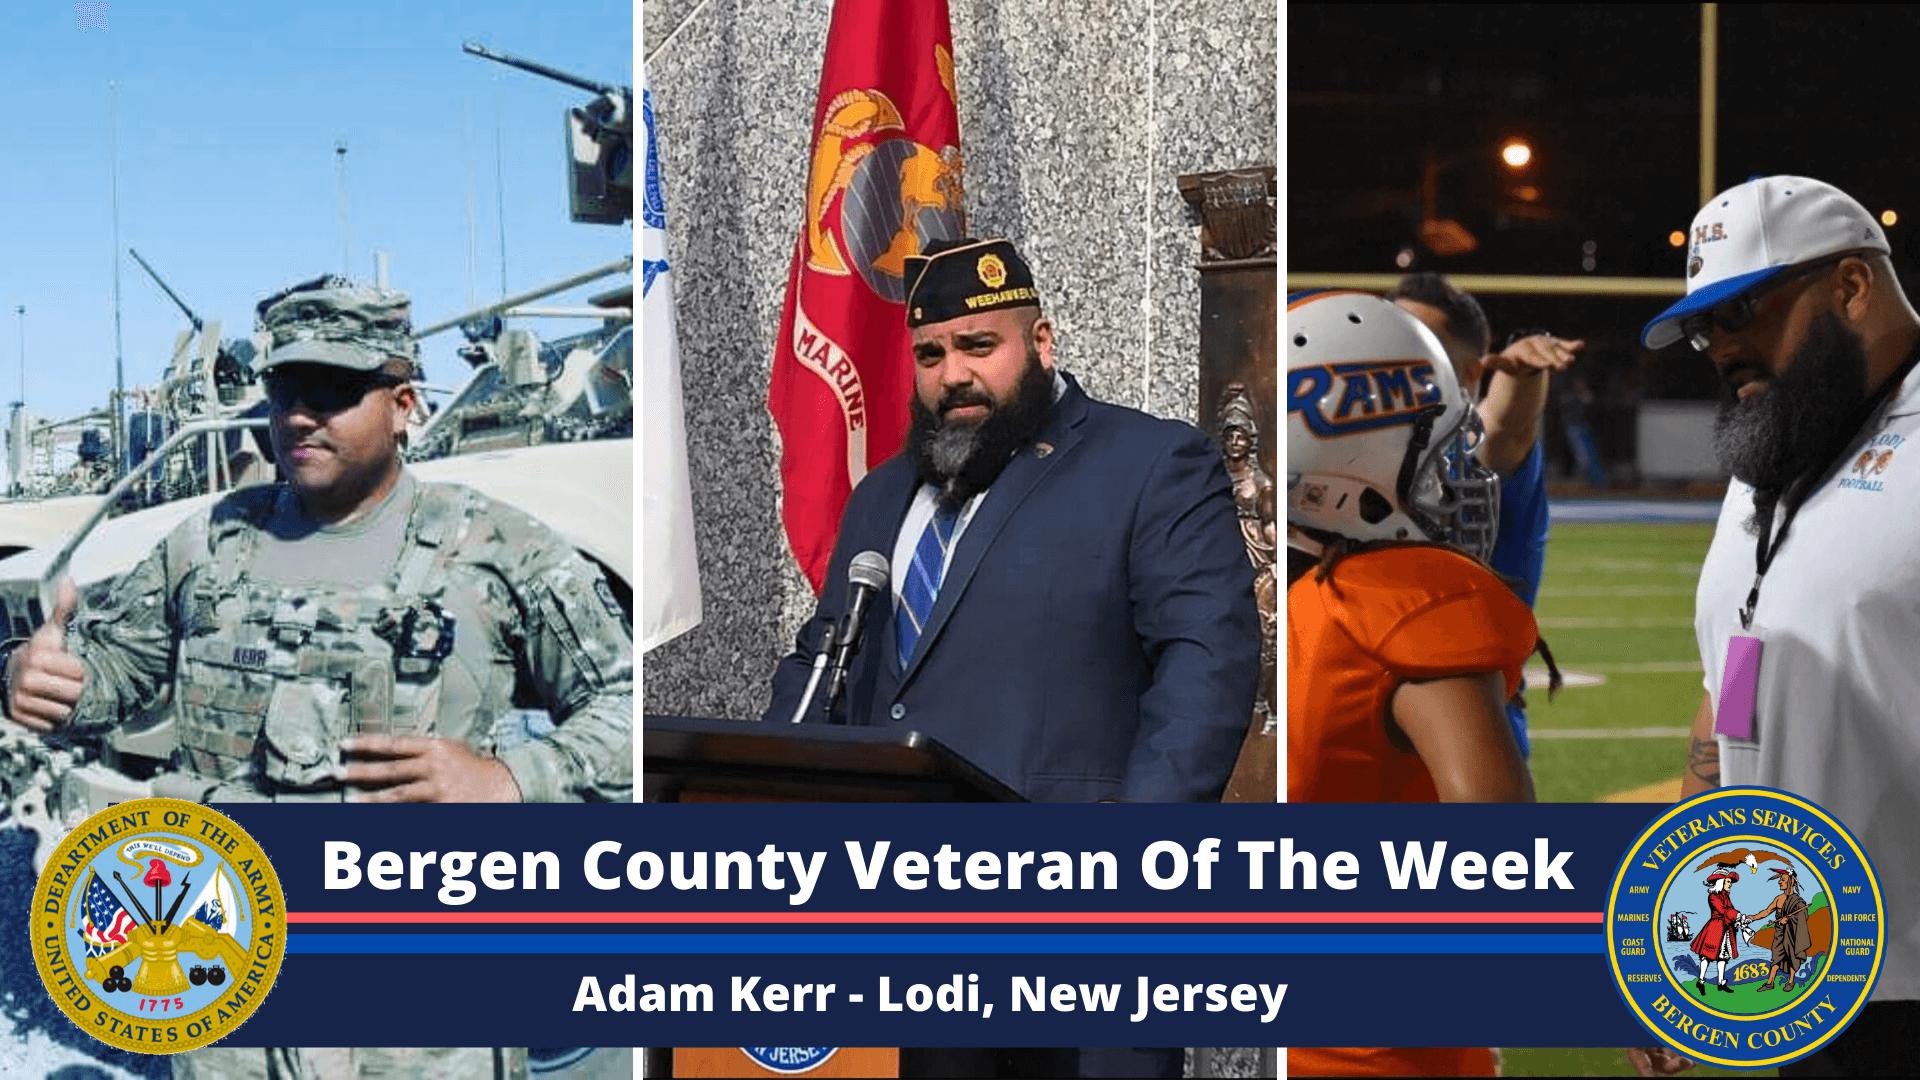 Bergen County Veteran of the Week: Adam Kerr